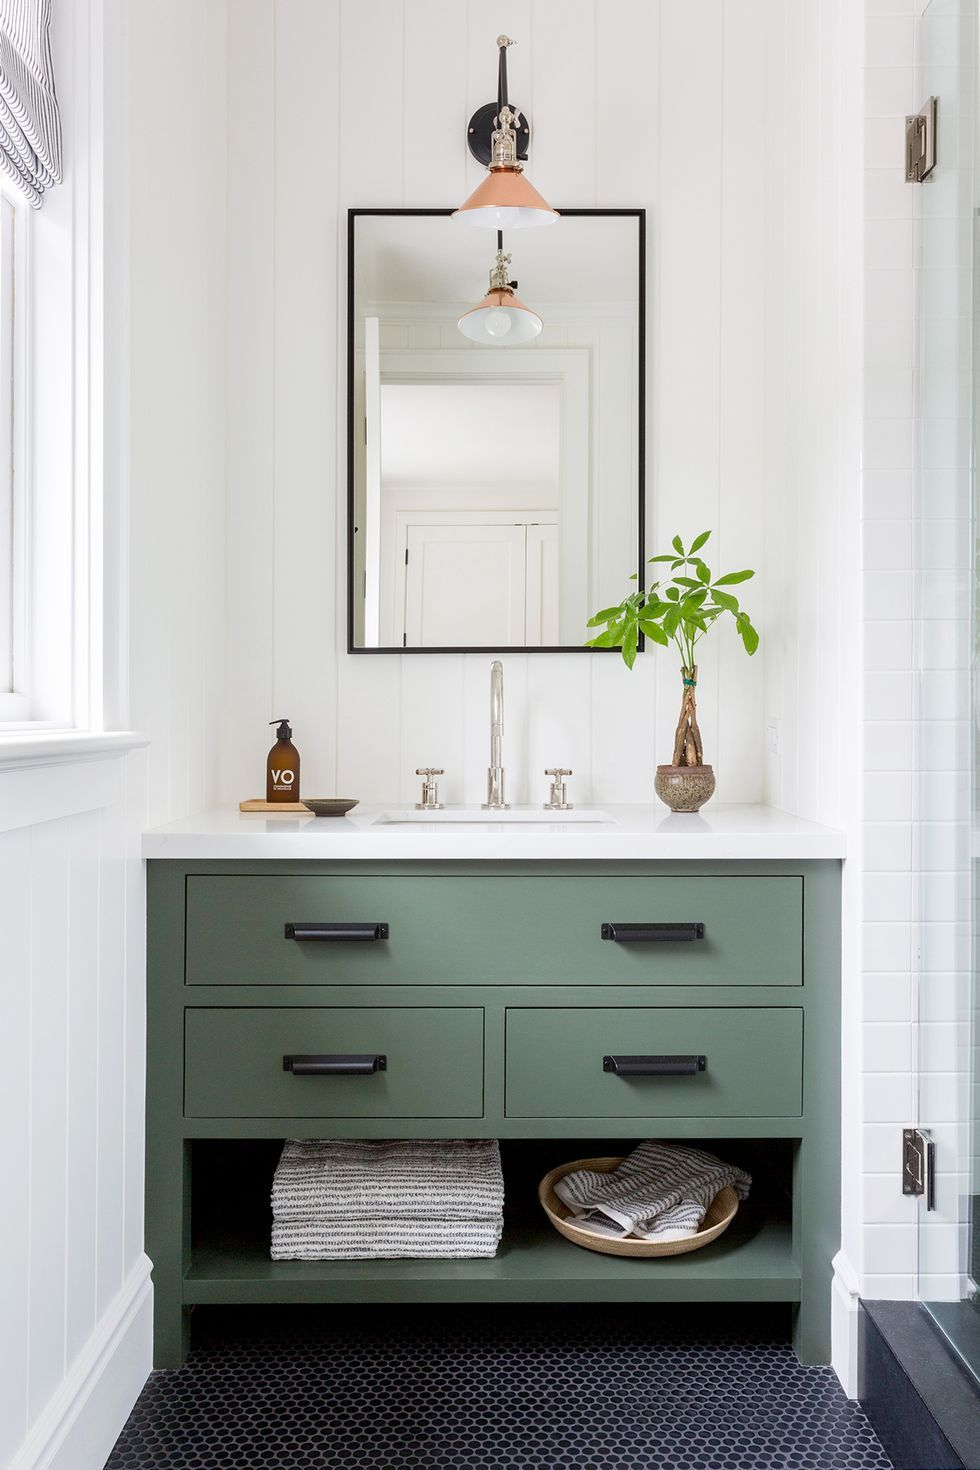 Simple Bathrooms Ideas Design Inspiration 27368 Design Decor Small Bathroom Renovations Cheap Bathrooms Bathroom Makeovers On A Budget